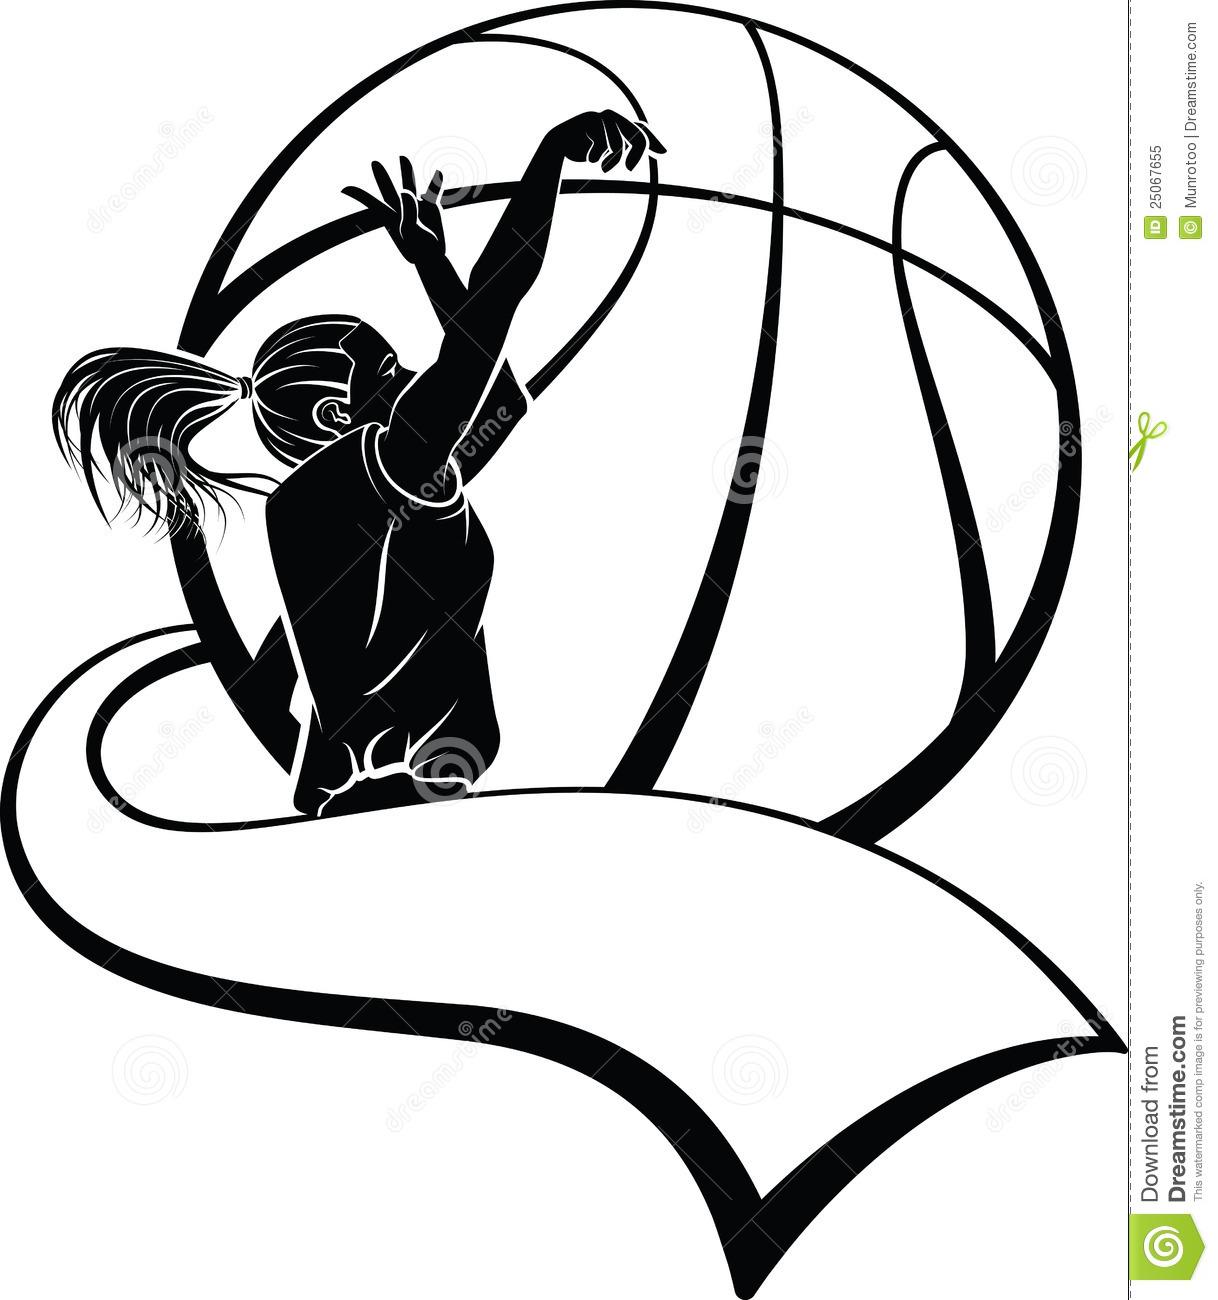 1218x1300 Top 69 Basketball Clip Art